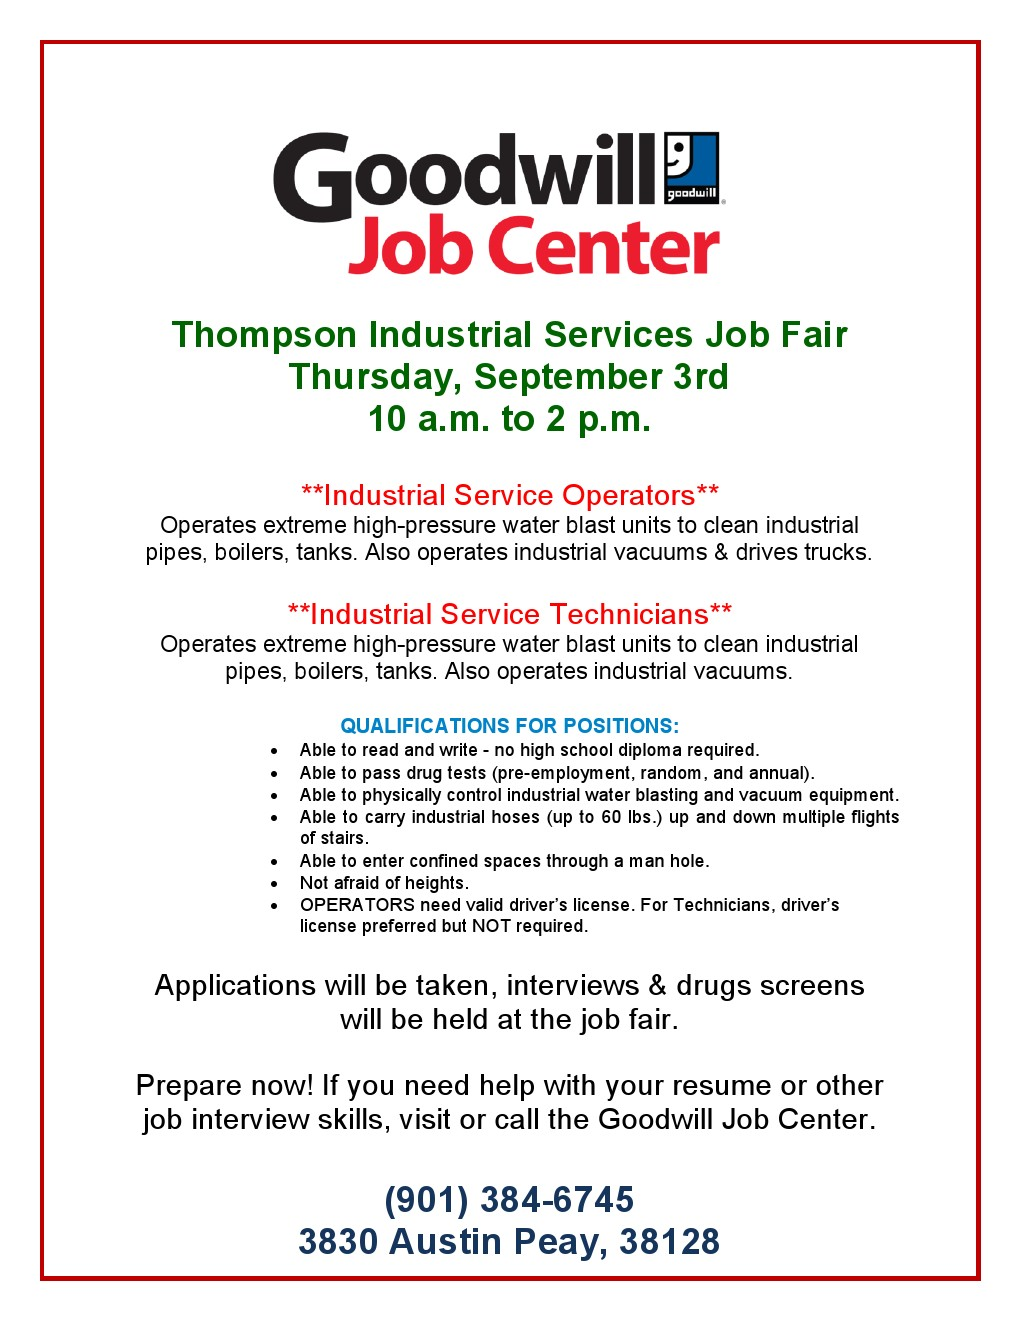 thompson industrial services job fair september 3 job career